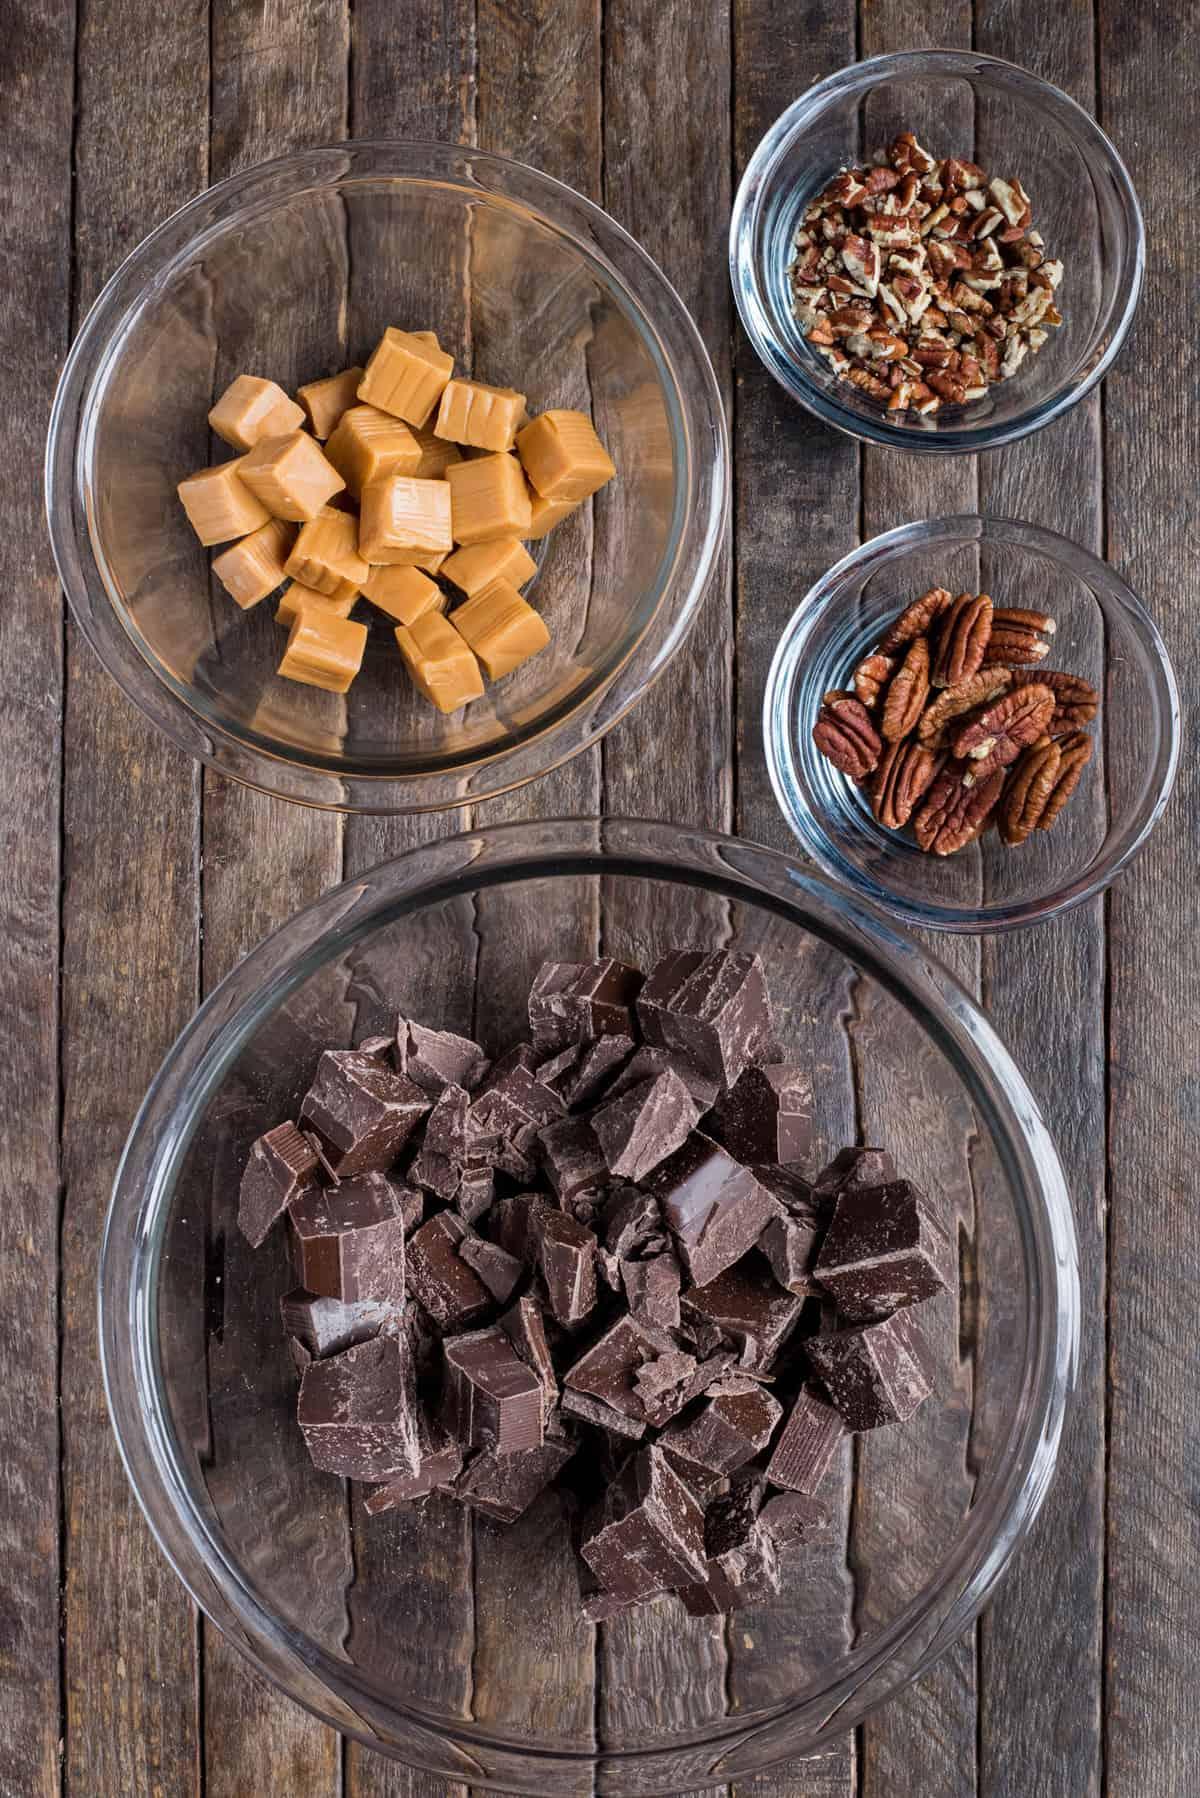 ingredients to make turtle bark in glass bowls on dark wood background